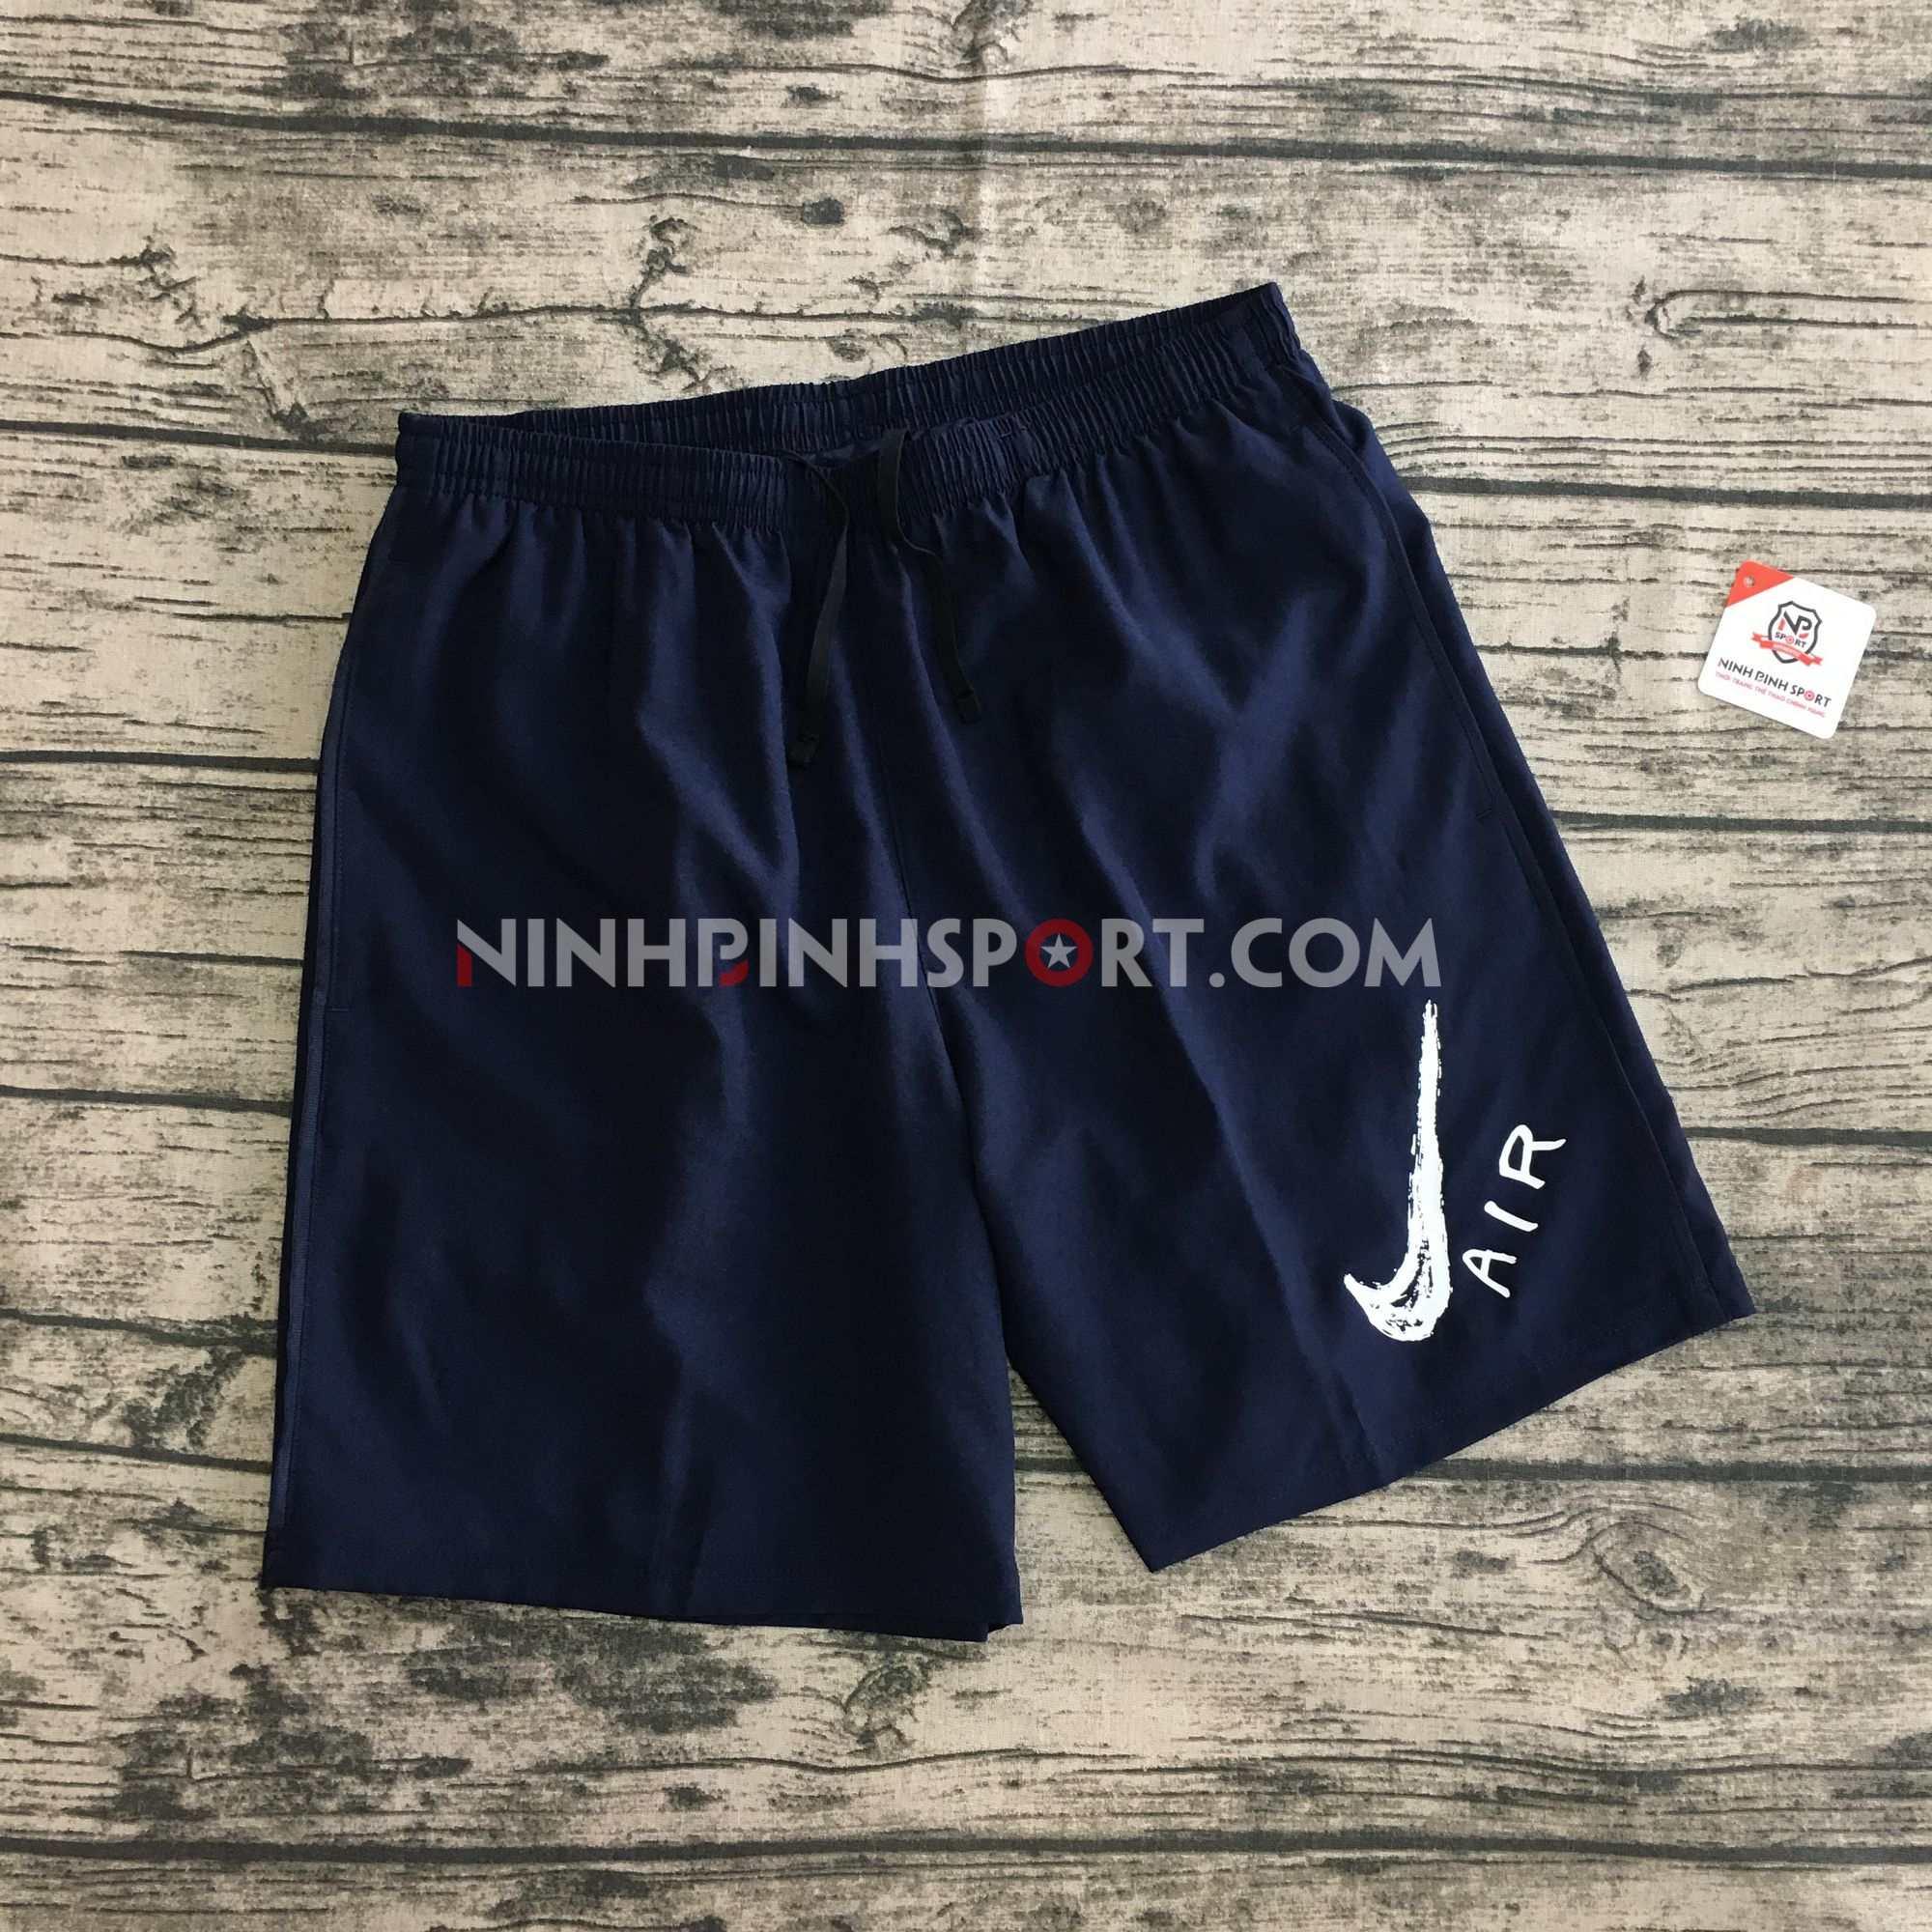 Quần thể thao nam Nike Orchid GX 7in AJ7756-451